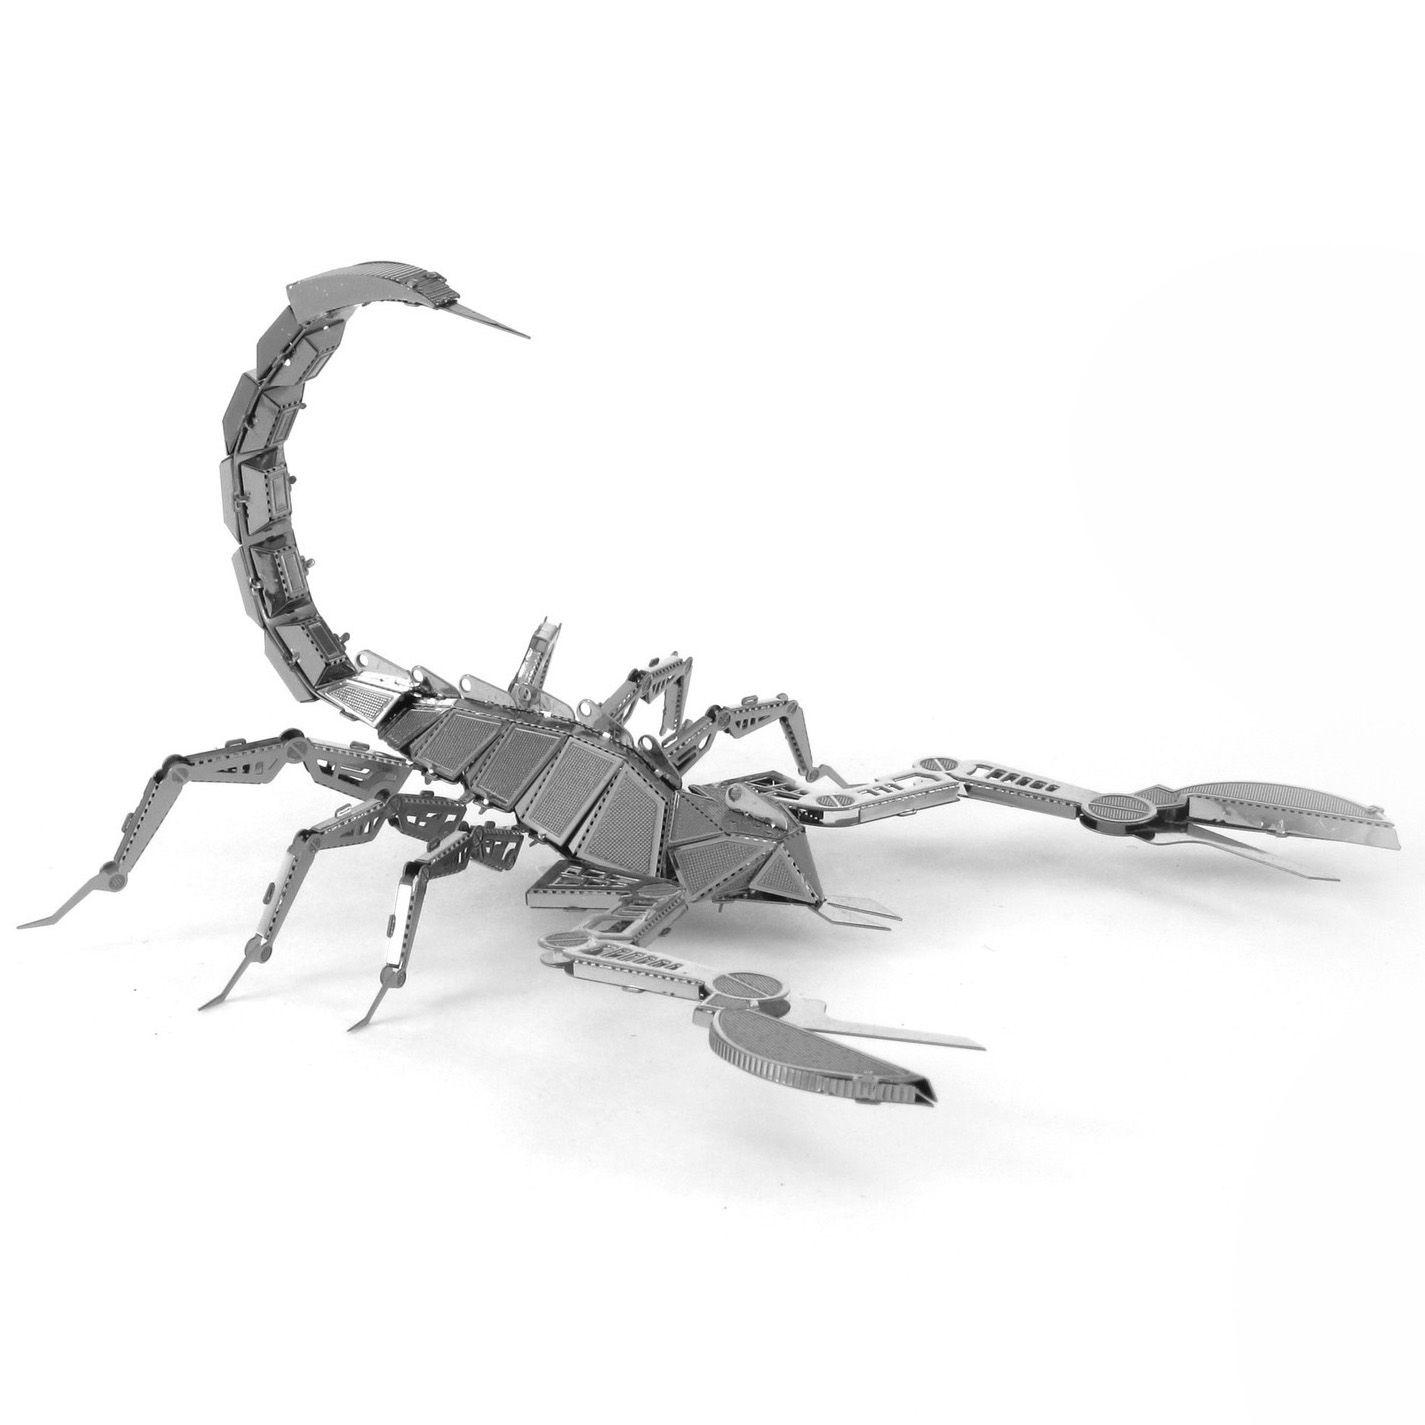 DIY Metal 3D Miniature Scorpion Model Kids Puzzle Toys Jigsaw